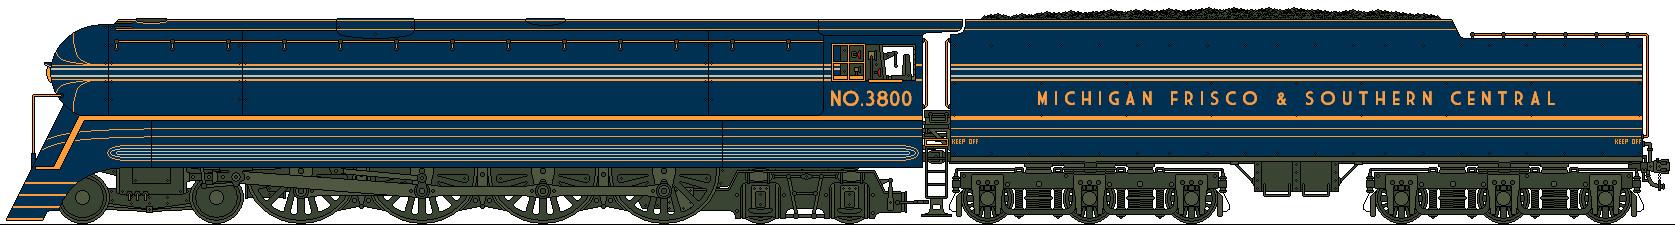 MFSC Streamliner No.3800 by Lapeer